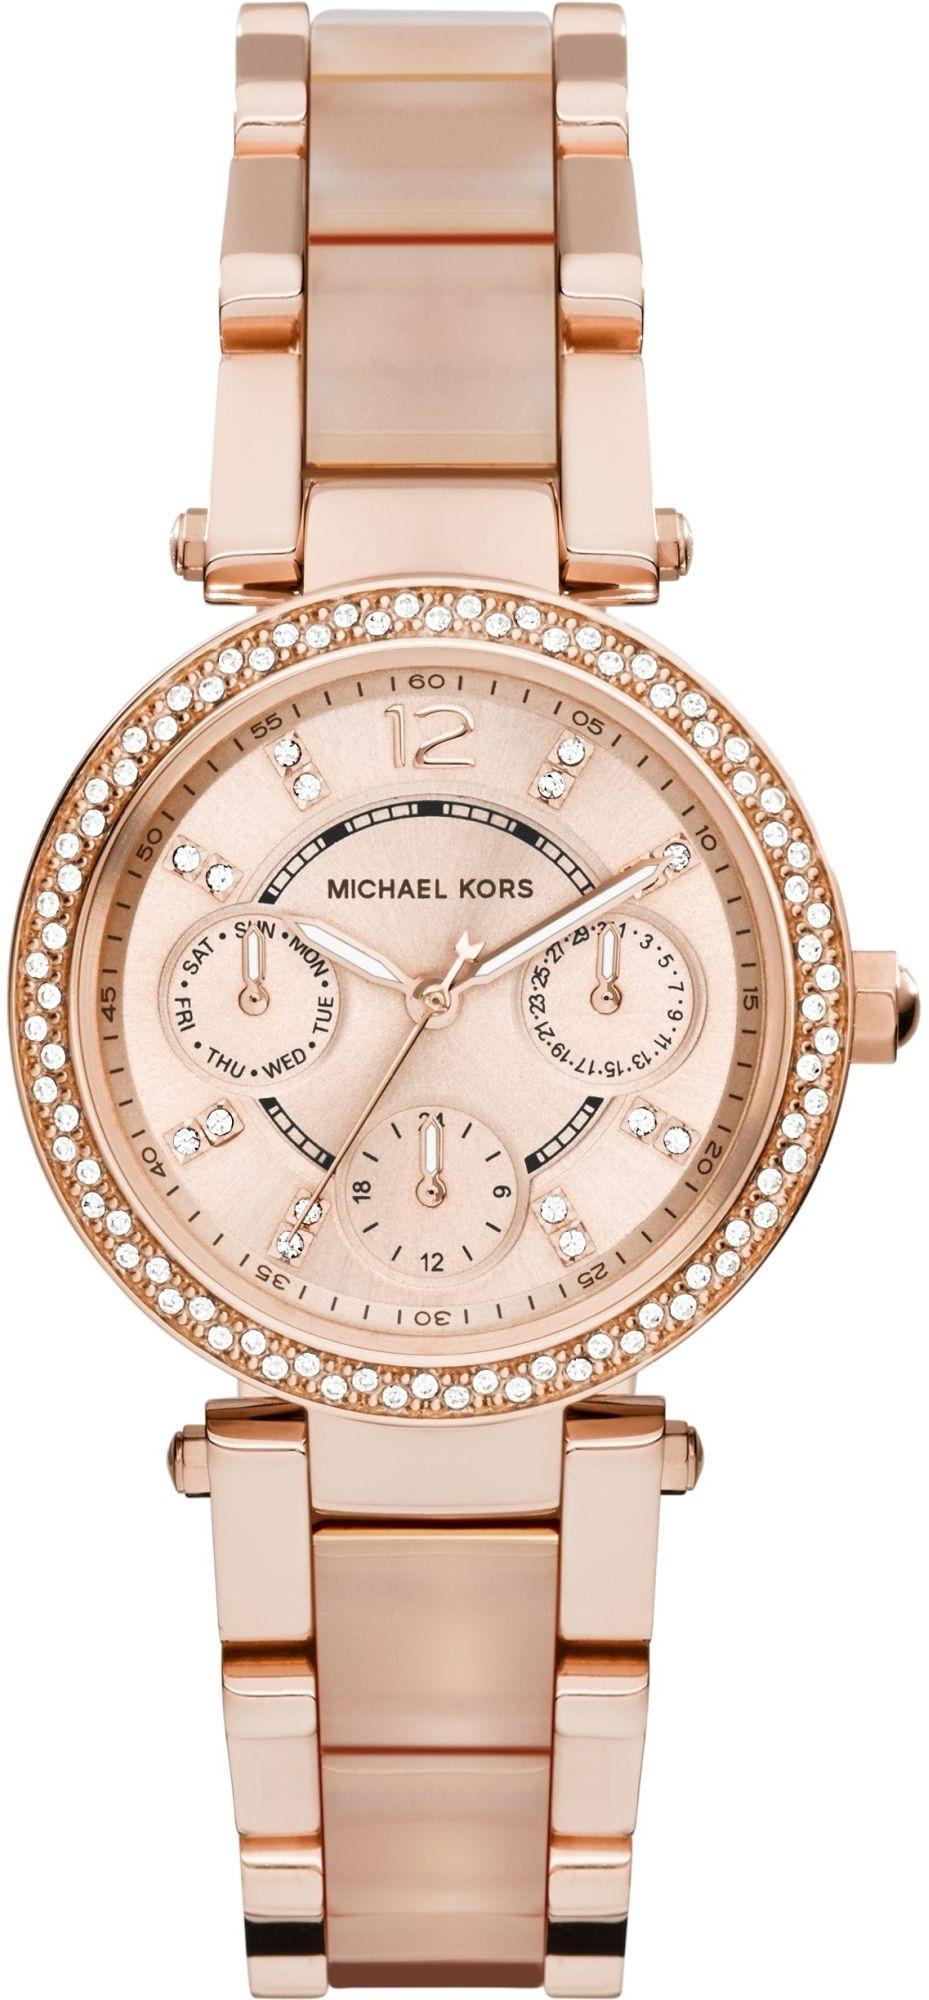 Michael Kors Women's Mini Parker Two-Tone Watch MK6110